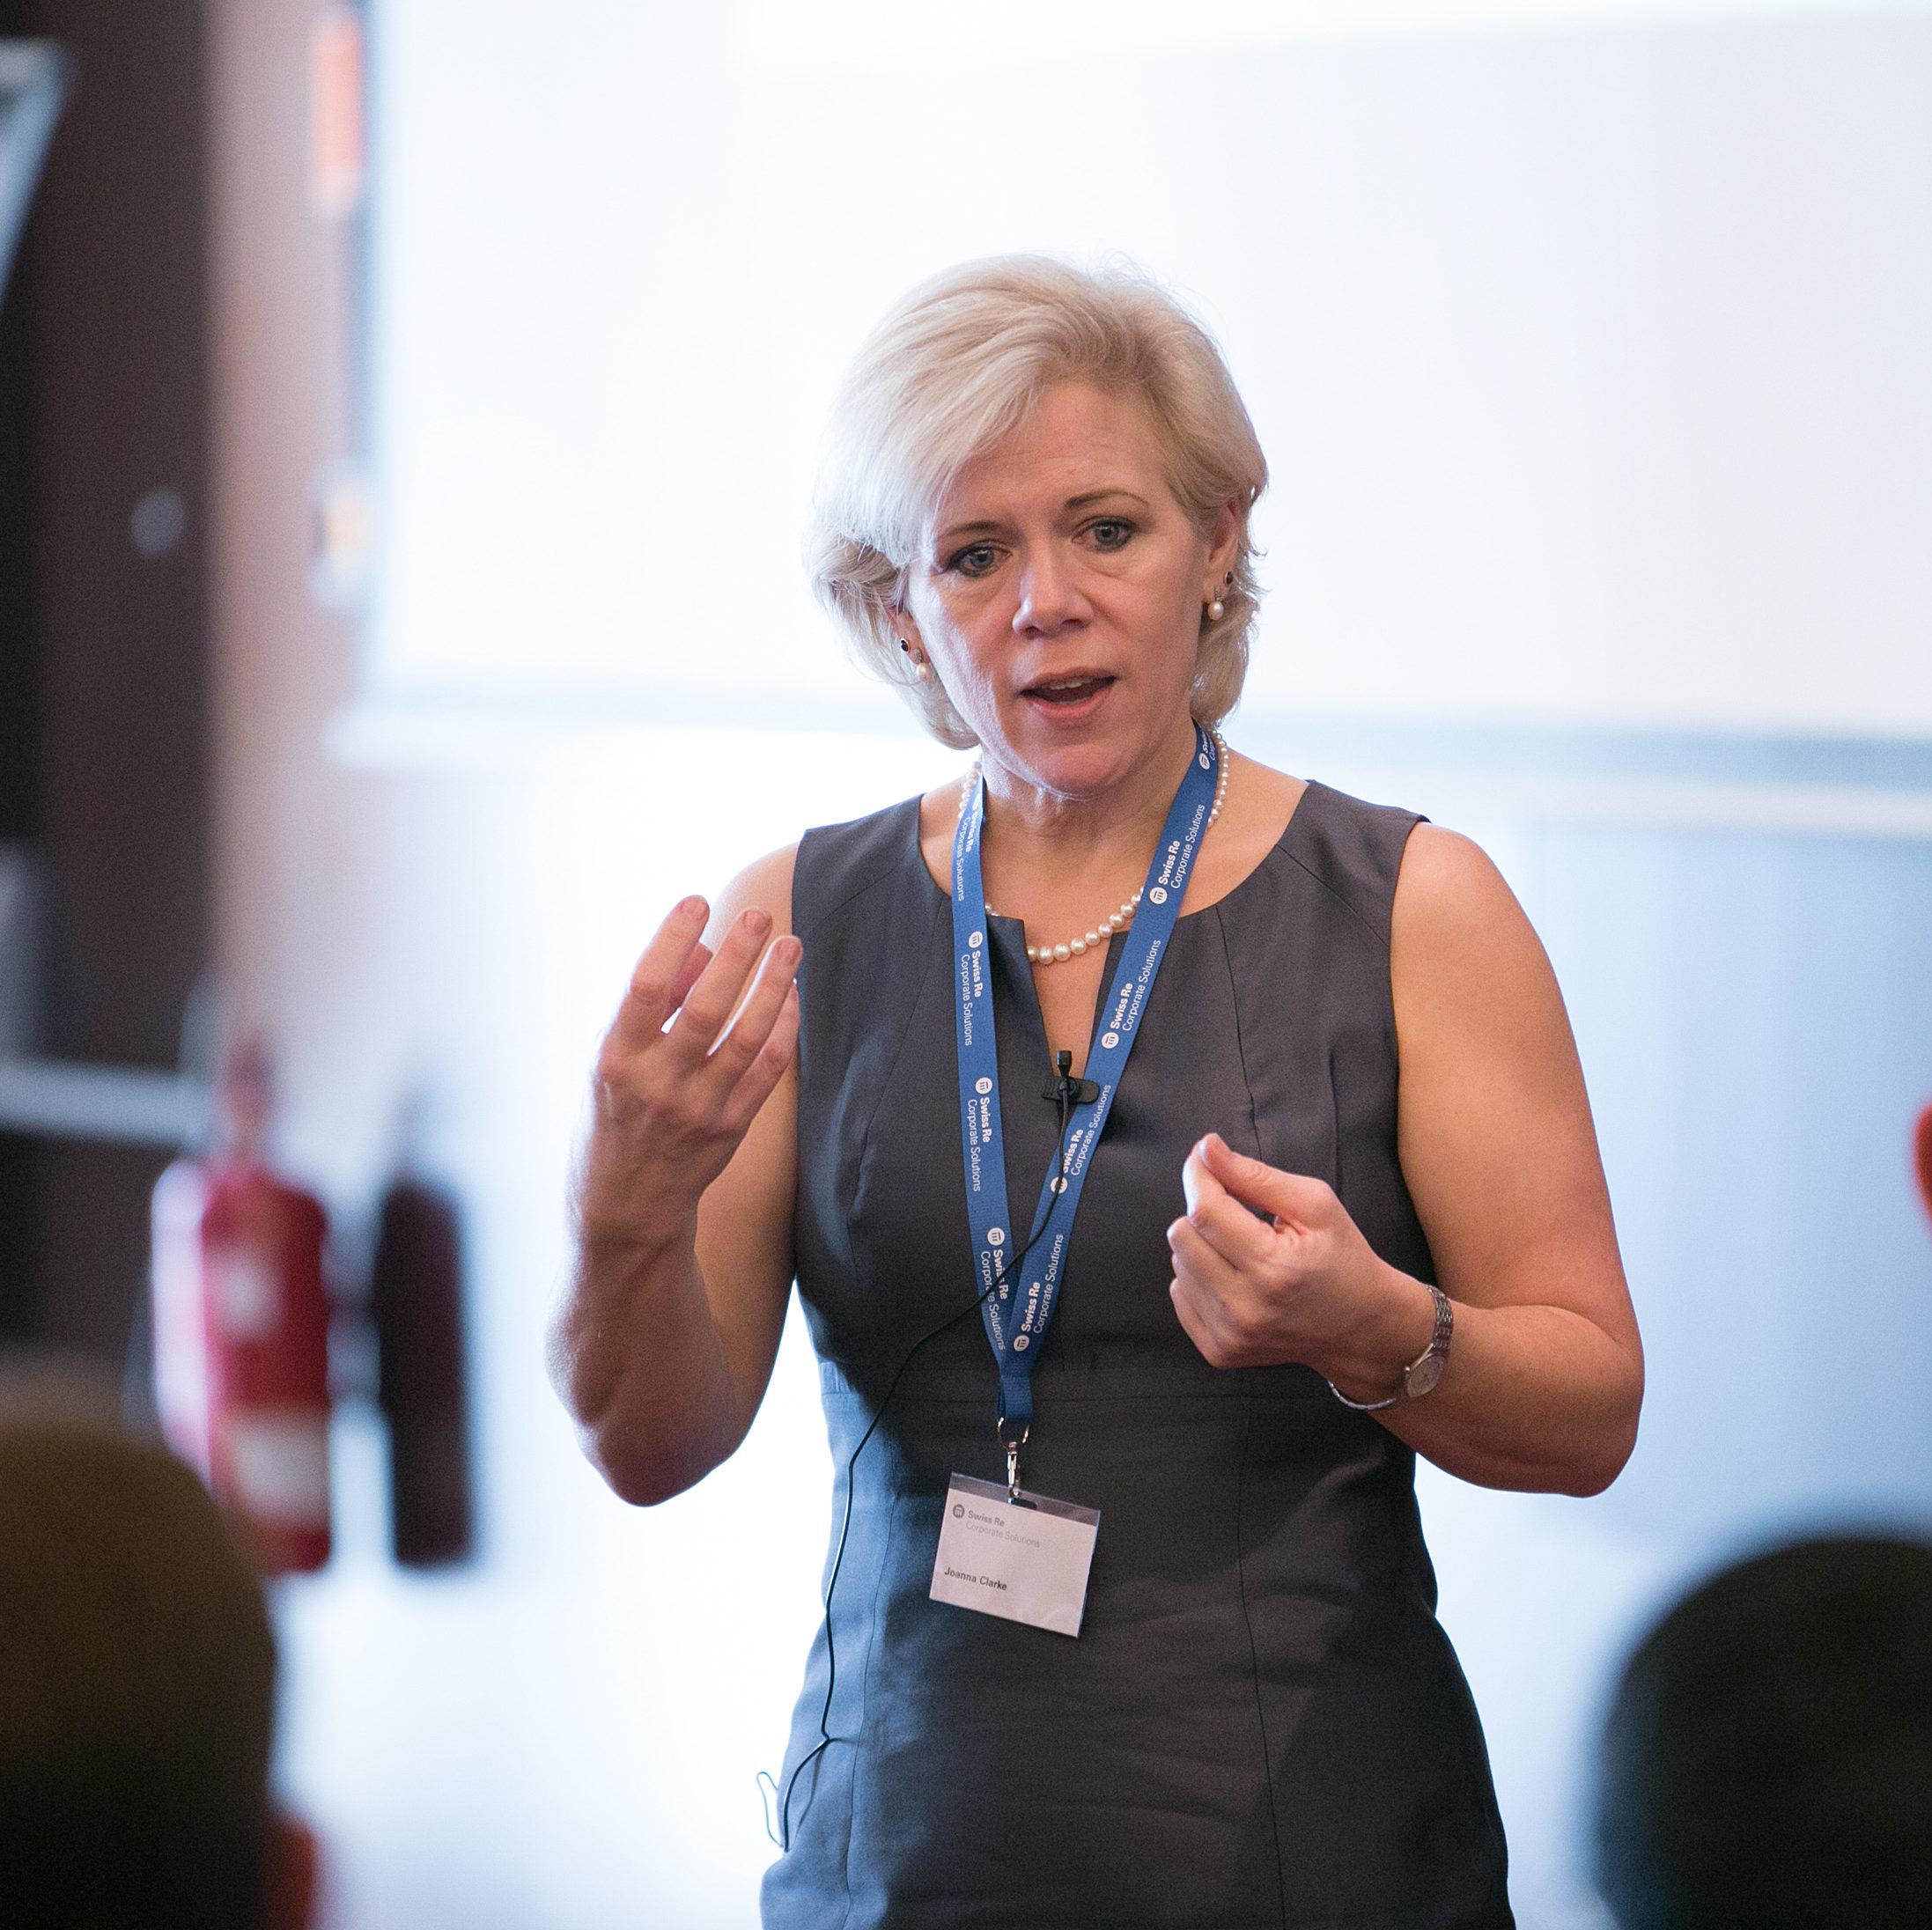 Professor Jo Clarke PhD - Petros - resilience for life